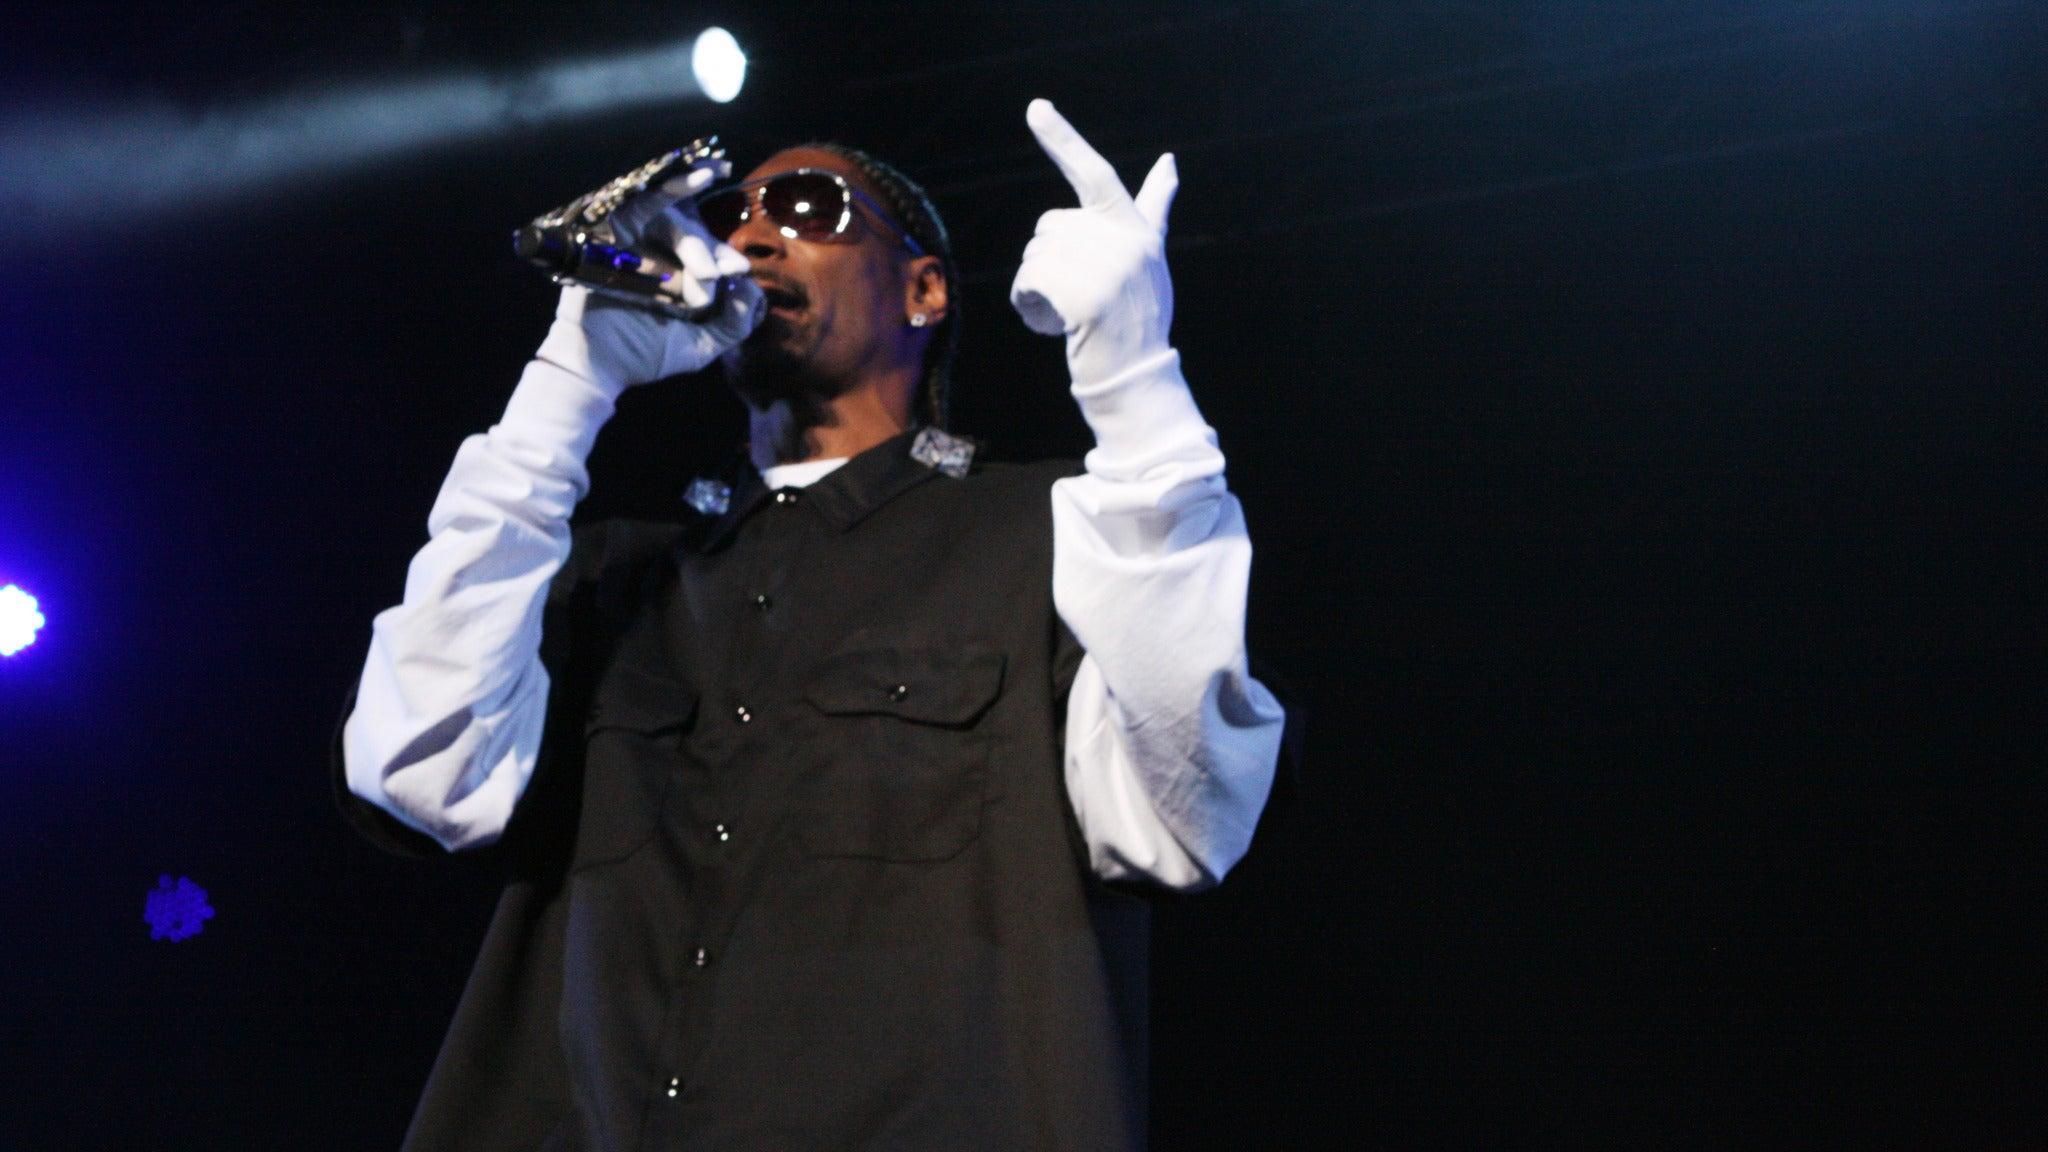 Snoop Dogg at Fox Theater - Oakland - Oakland, CA 94612